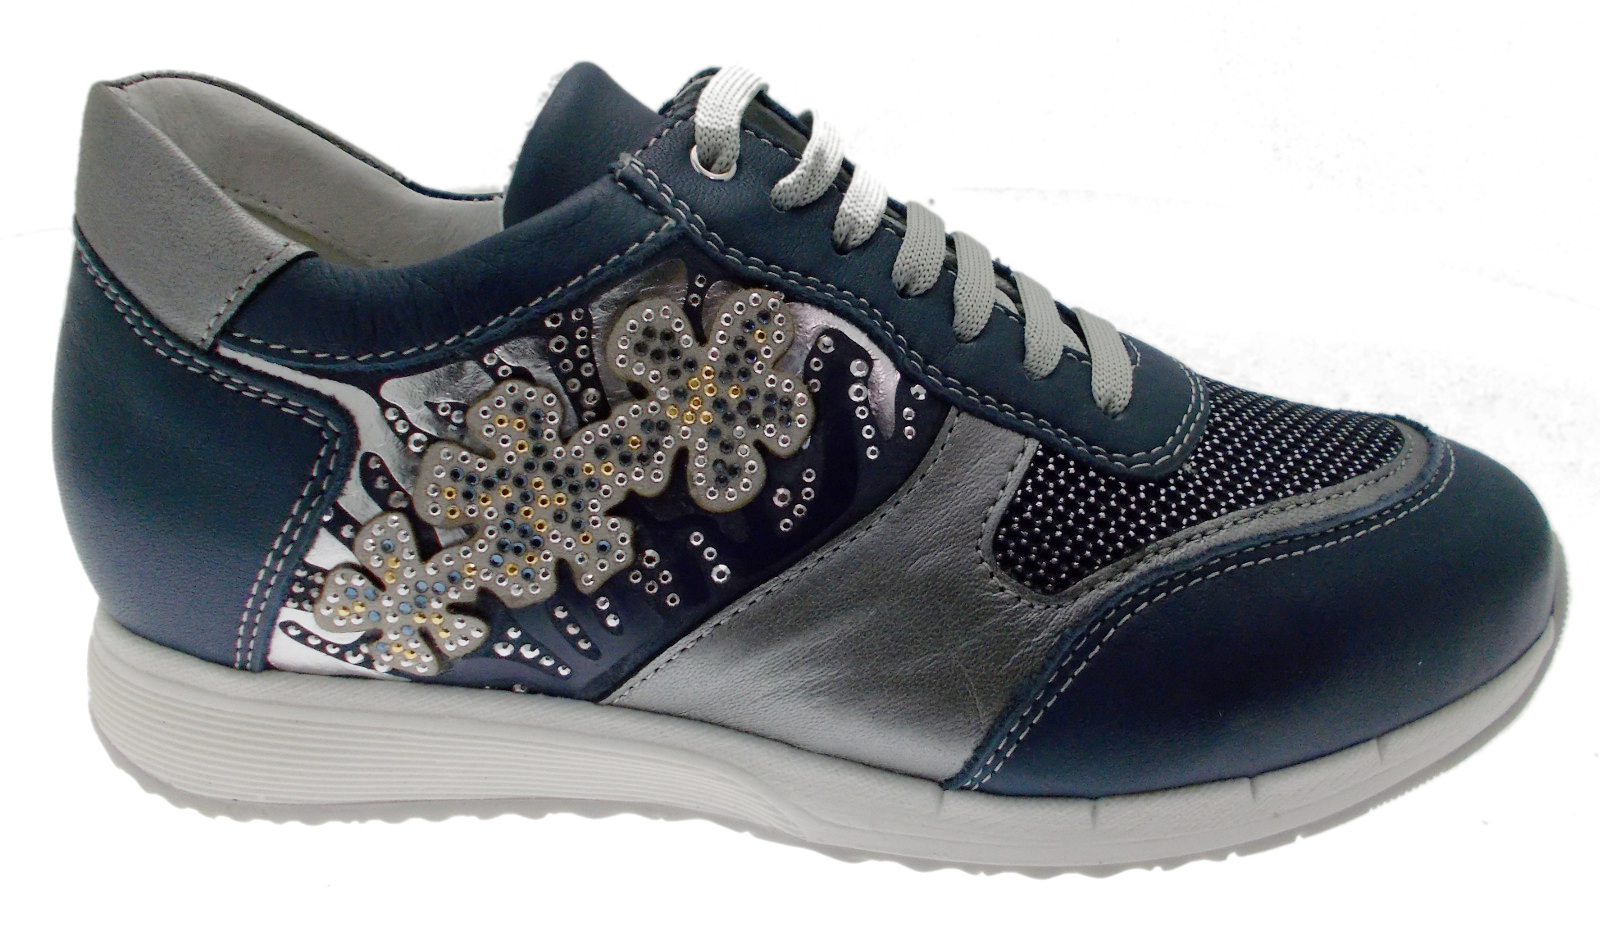 C3791 shoe woman orthopedic sneacker laces bluee Loren